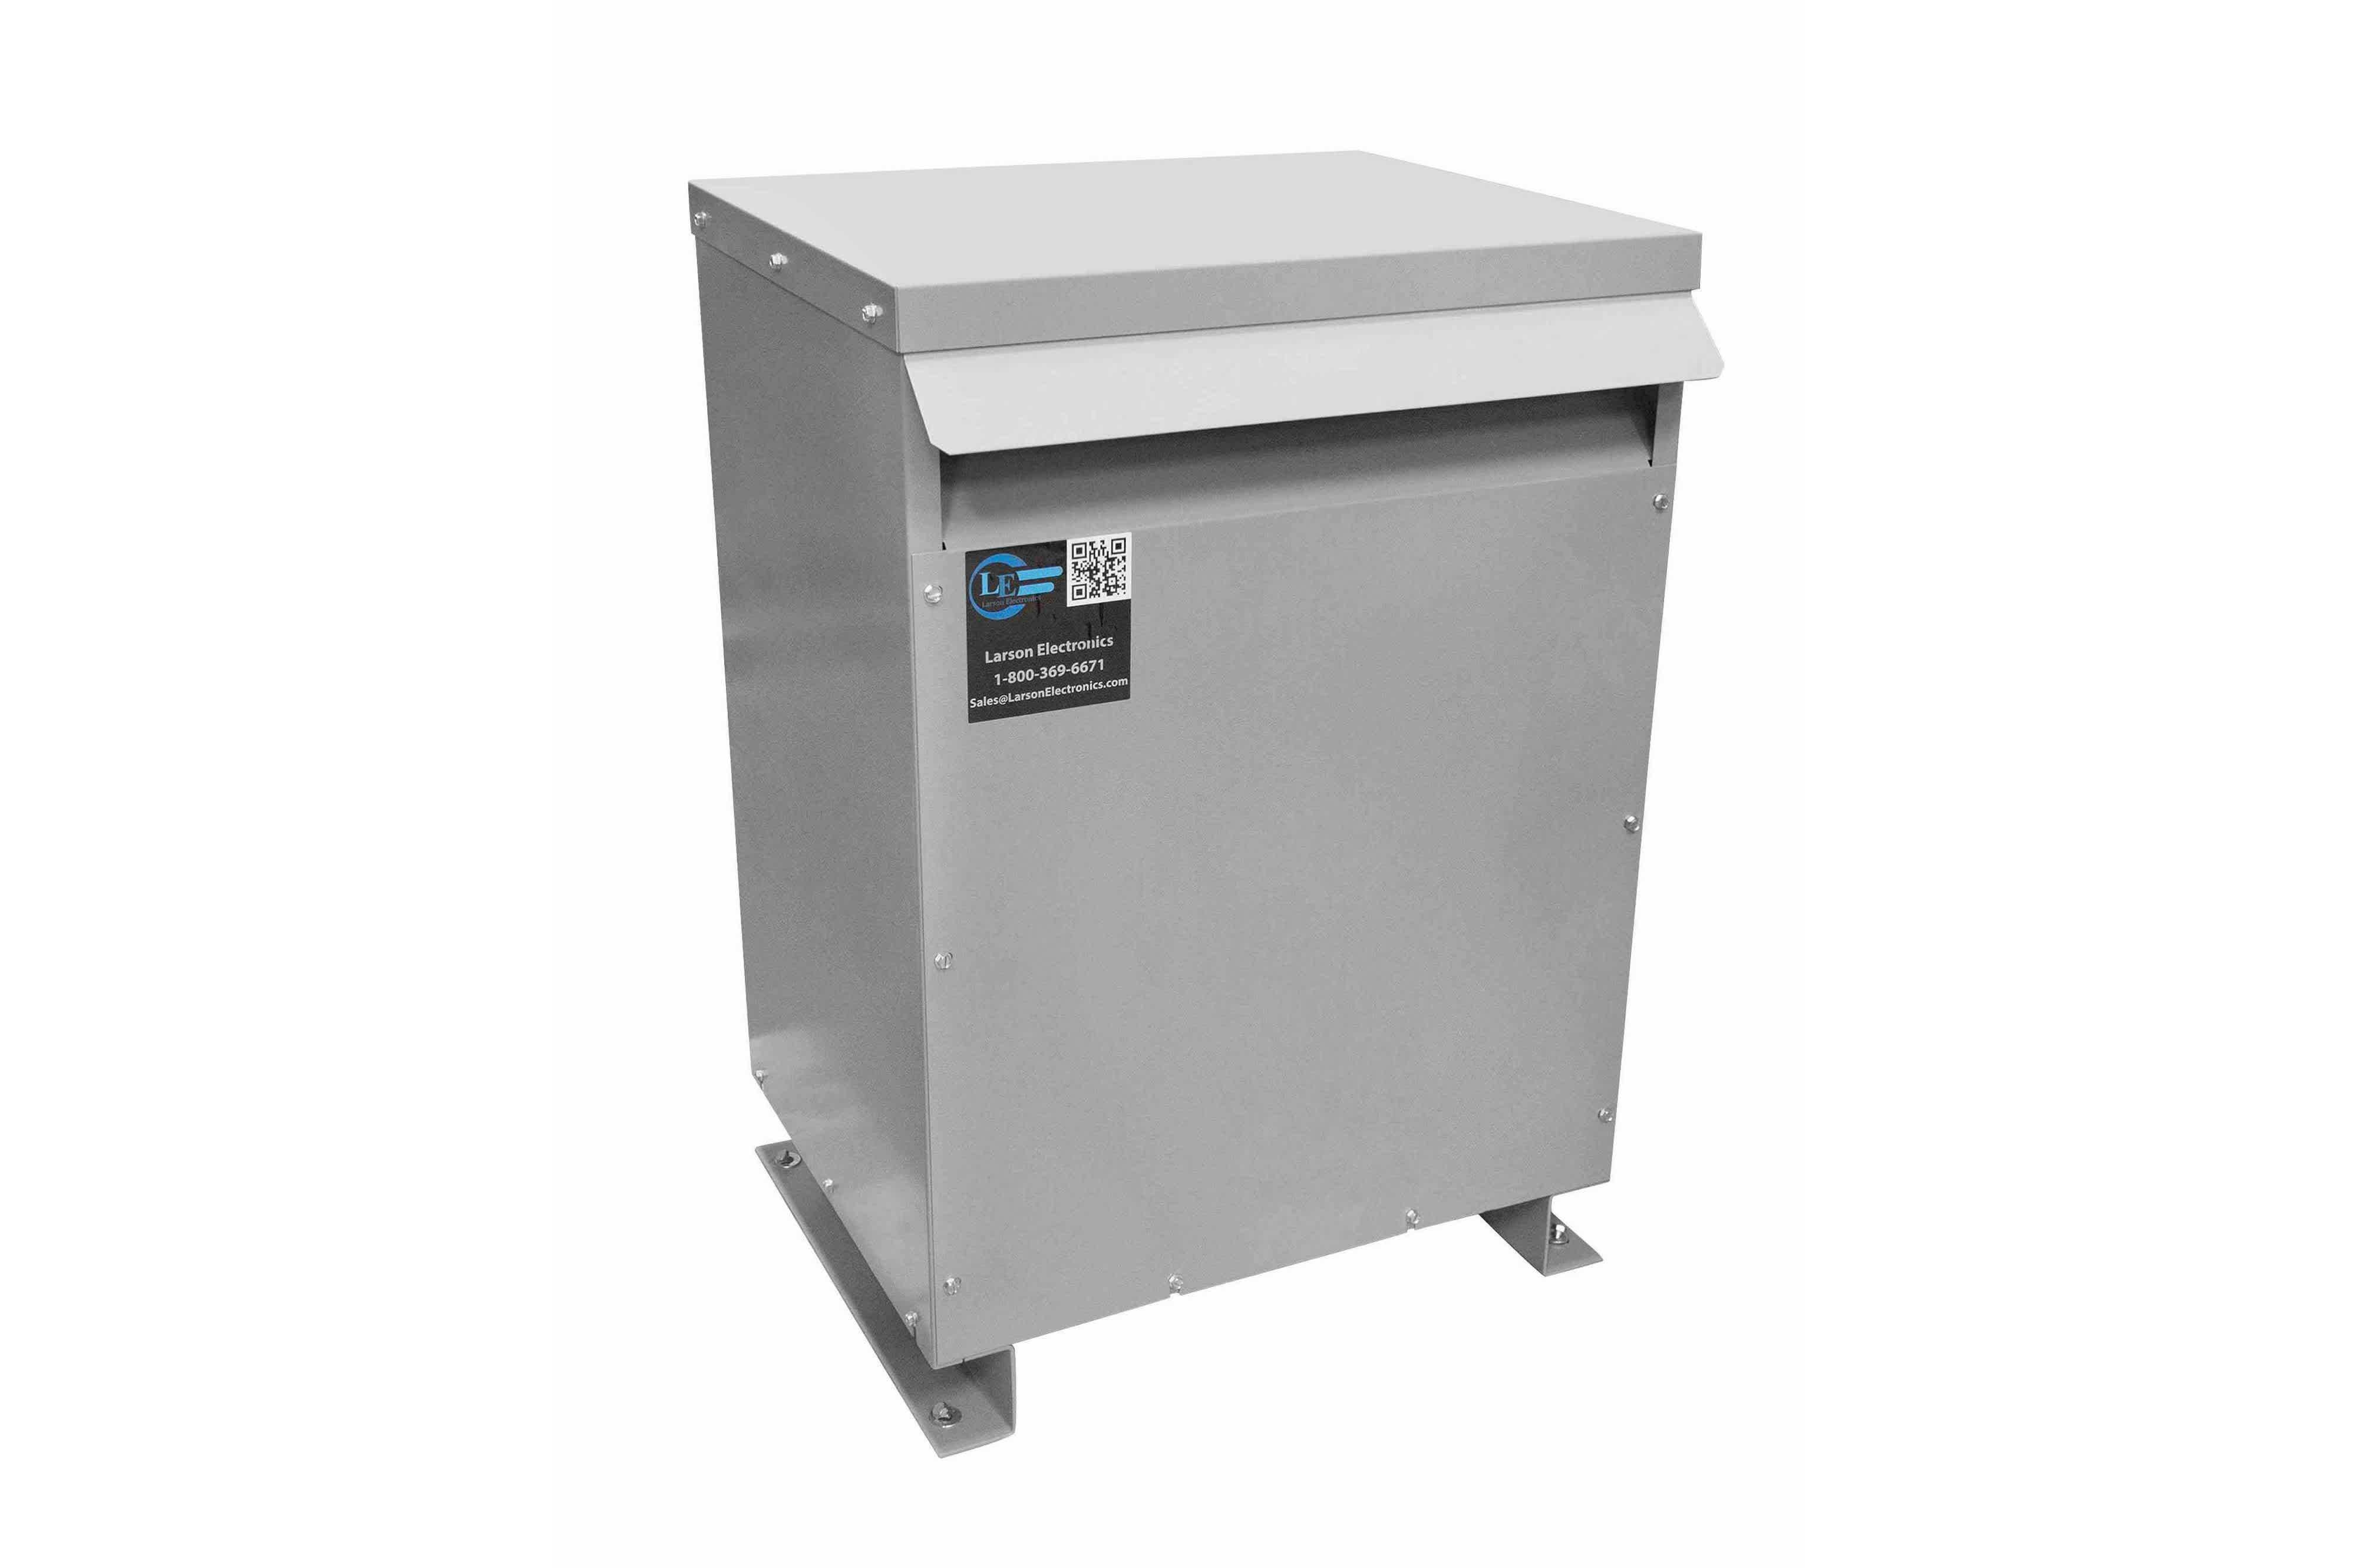 137.5 kVA 3PH Isolation Transformer, 220V Wye Primary, 208Y/120 Wye-N Secondary, N3R, Ventilated, 60 Hz